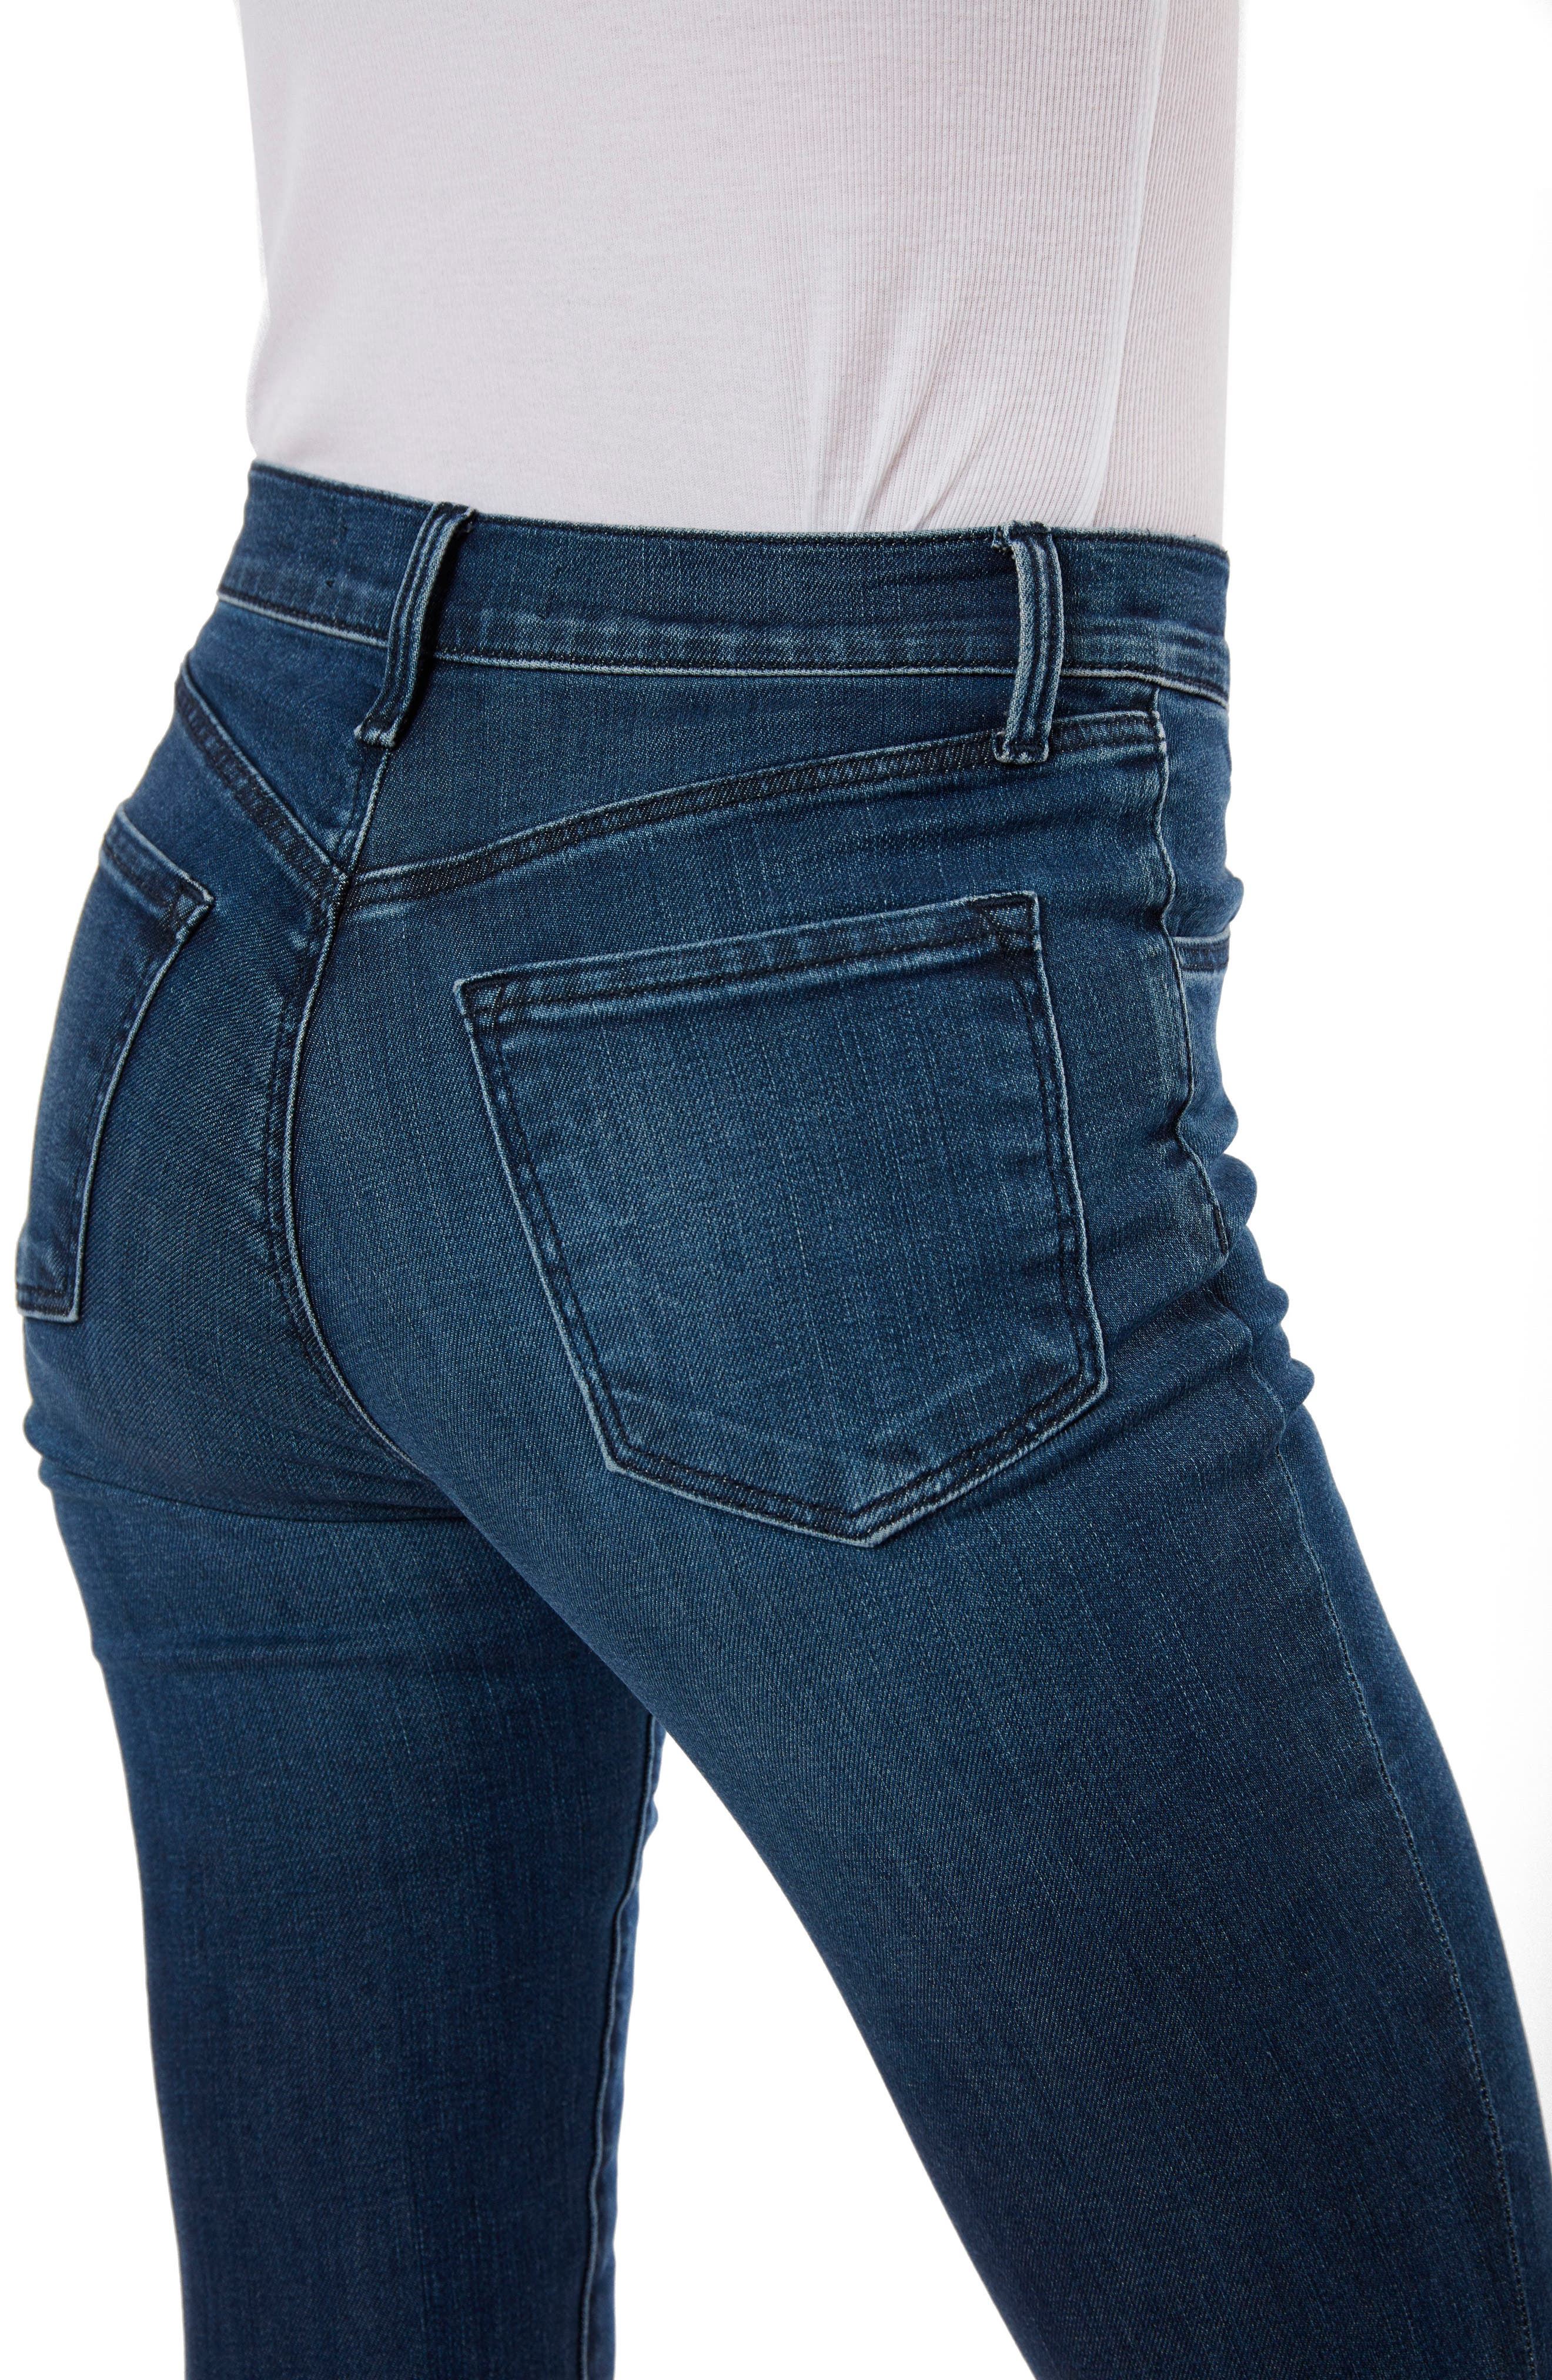 Maria High Waist Skinny Jeans,                             Alternate thumbnail 35, color,